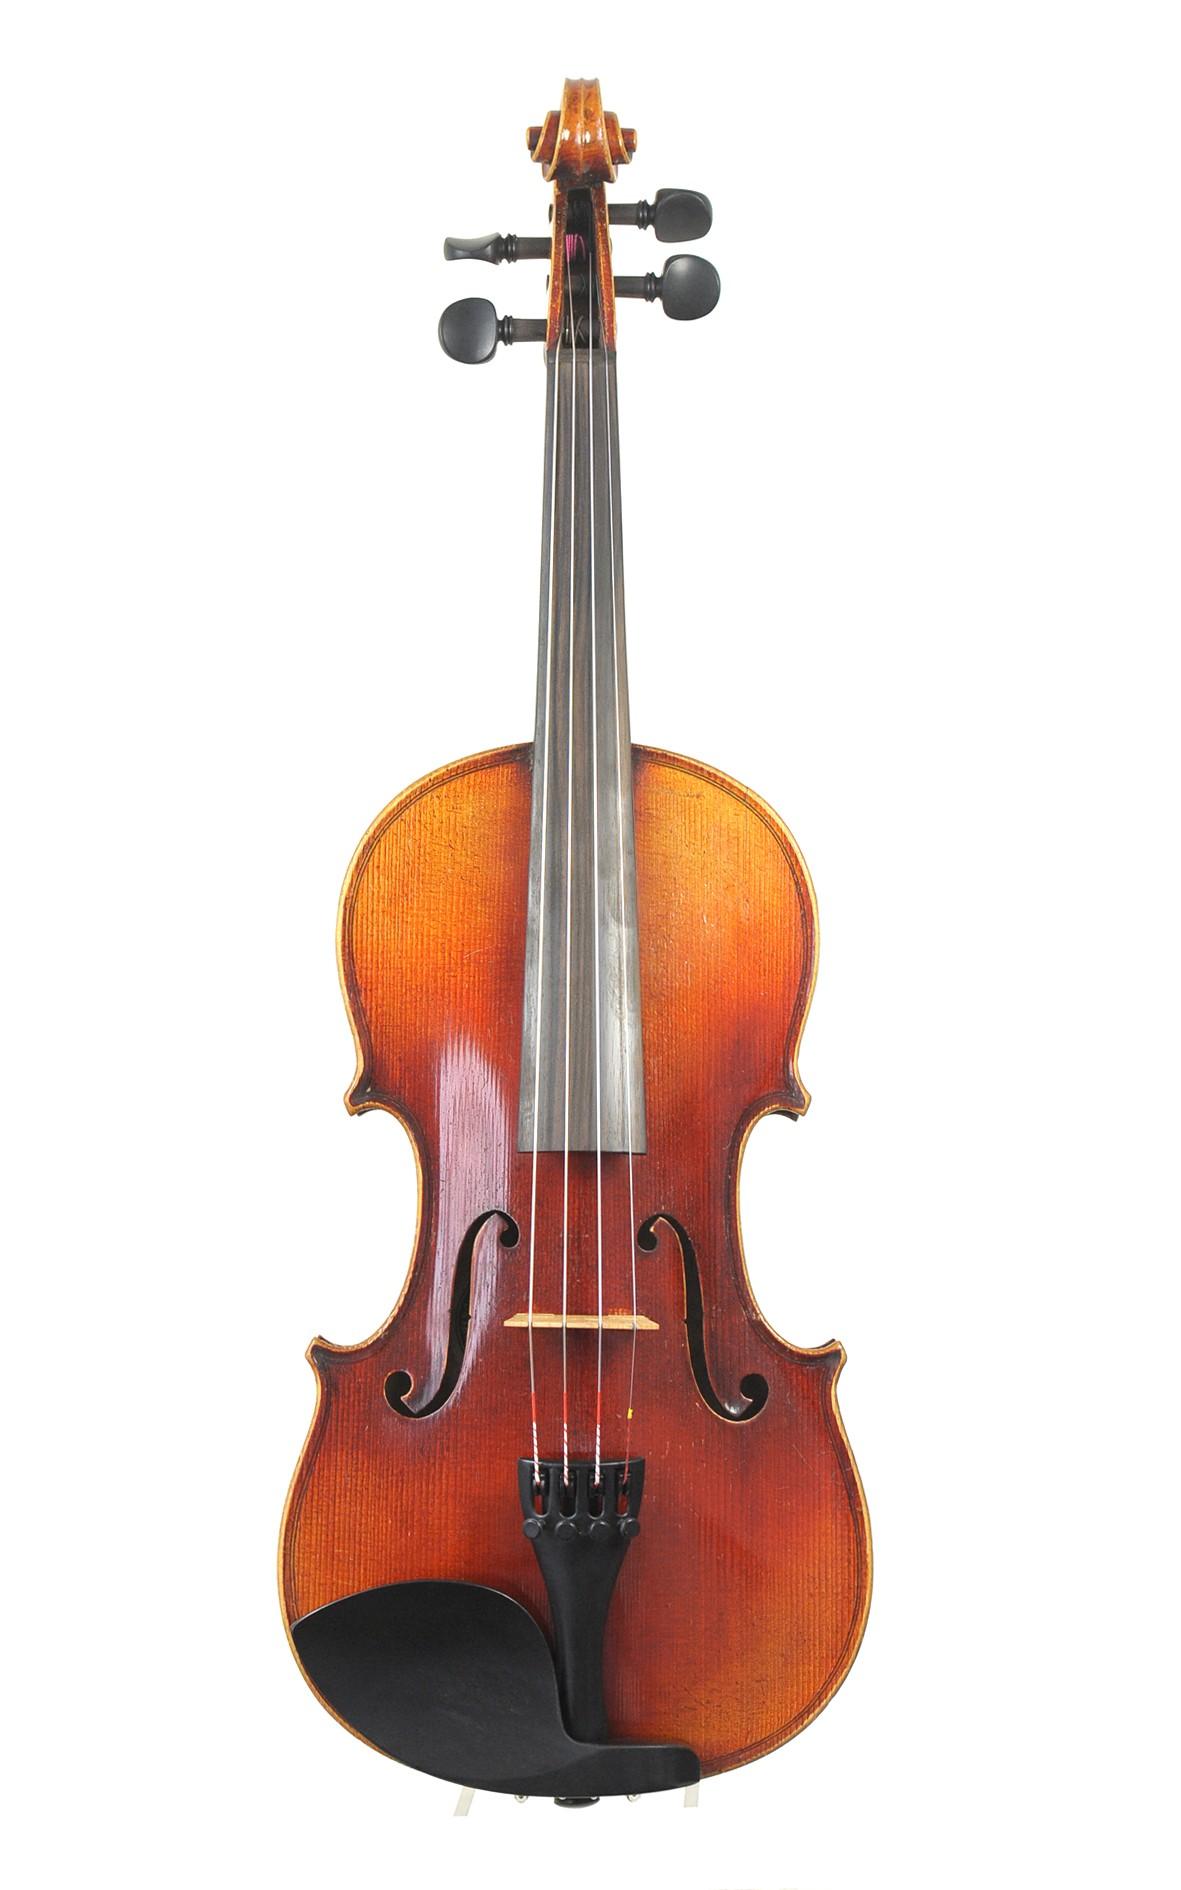 Antique violin, Albin Paulus, Markneukirchen c.1910 - top